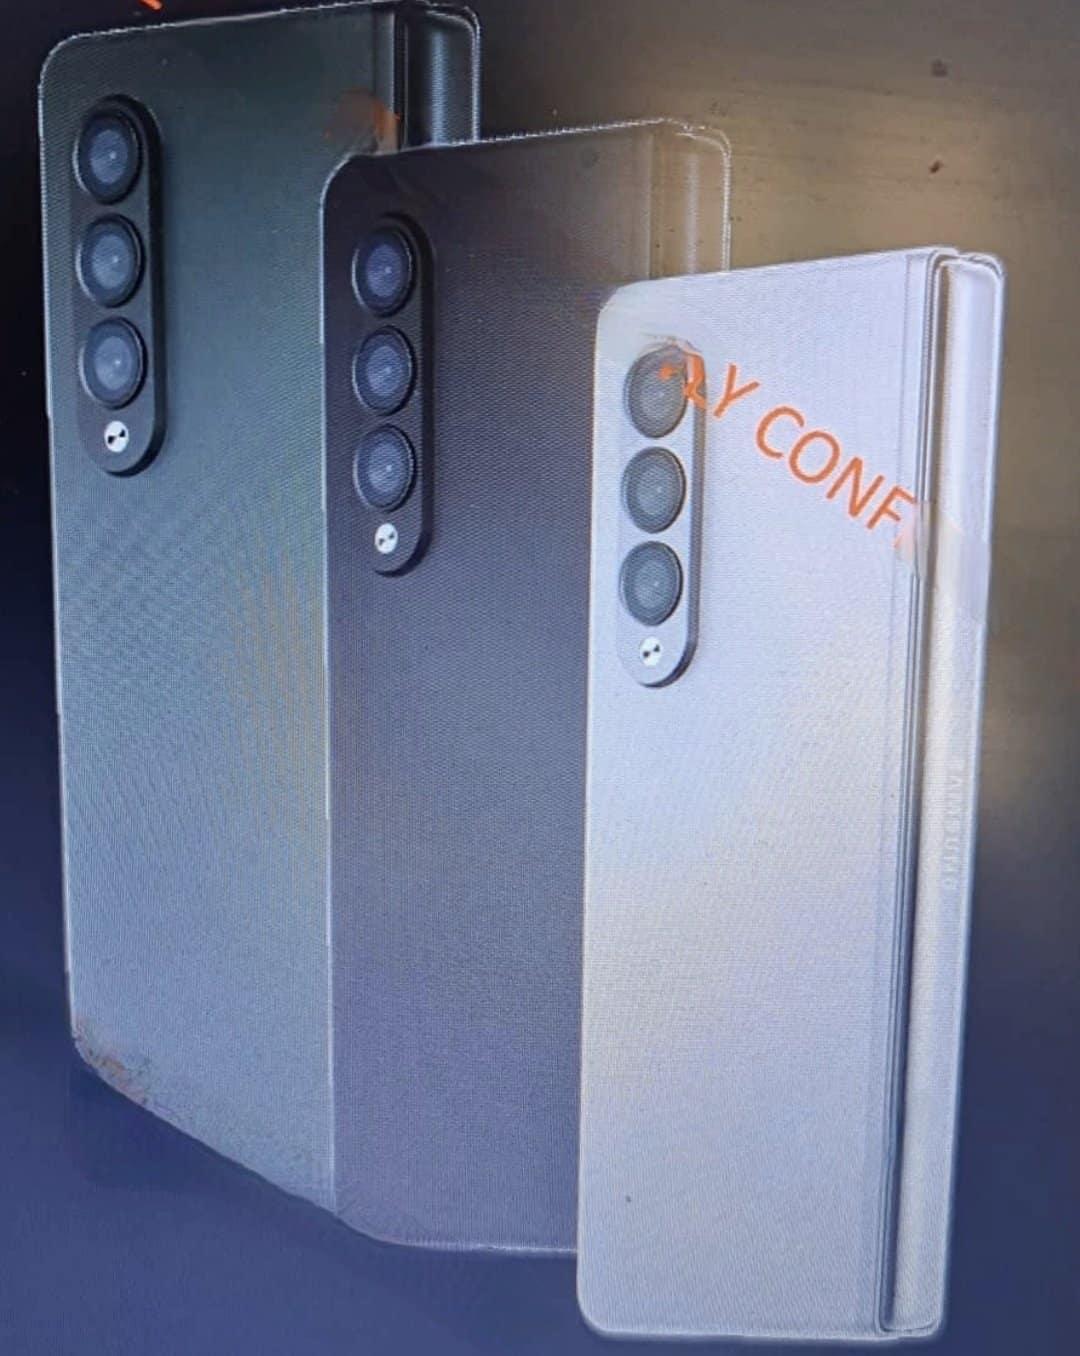 Galaxy Z Fold 3 design leak 1